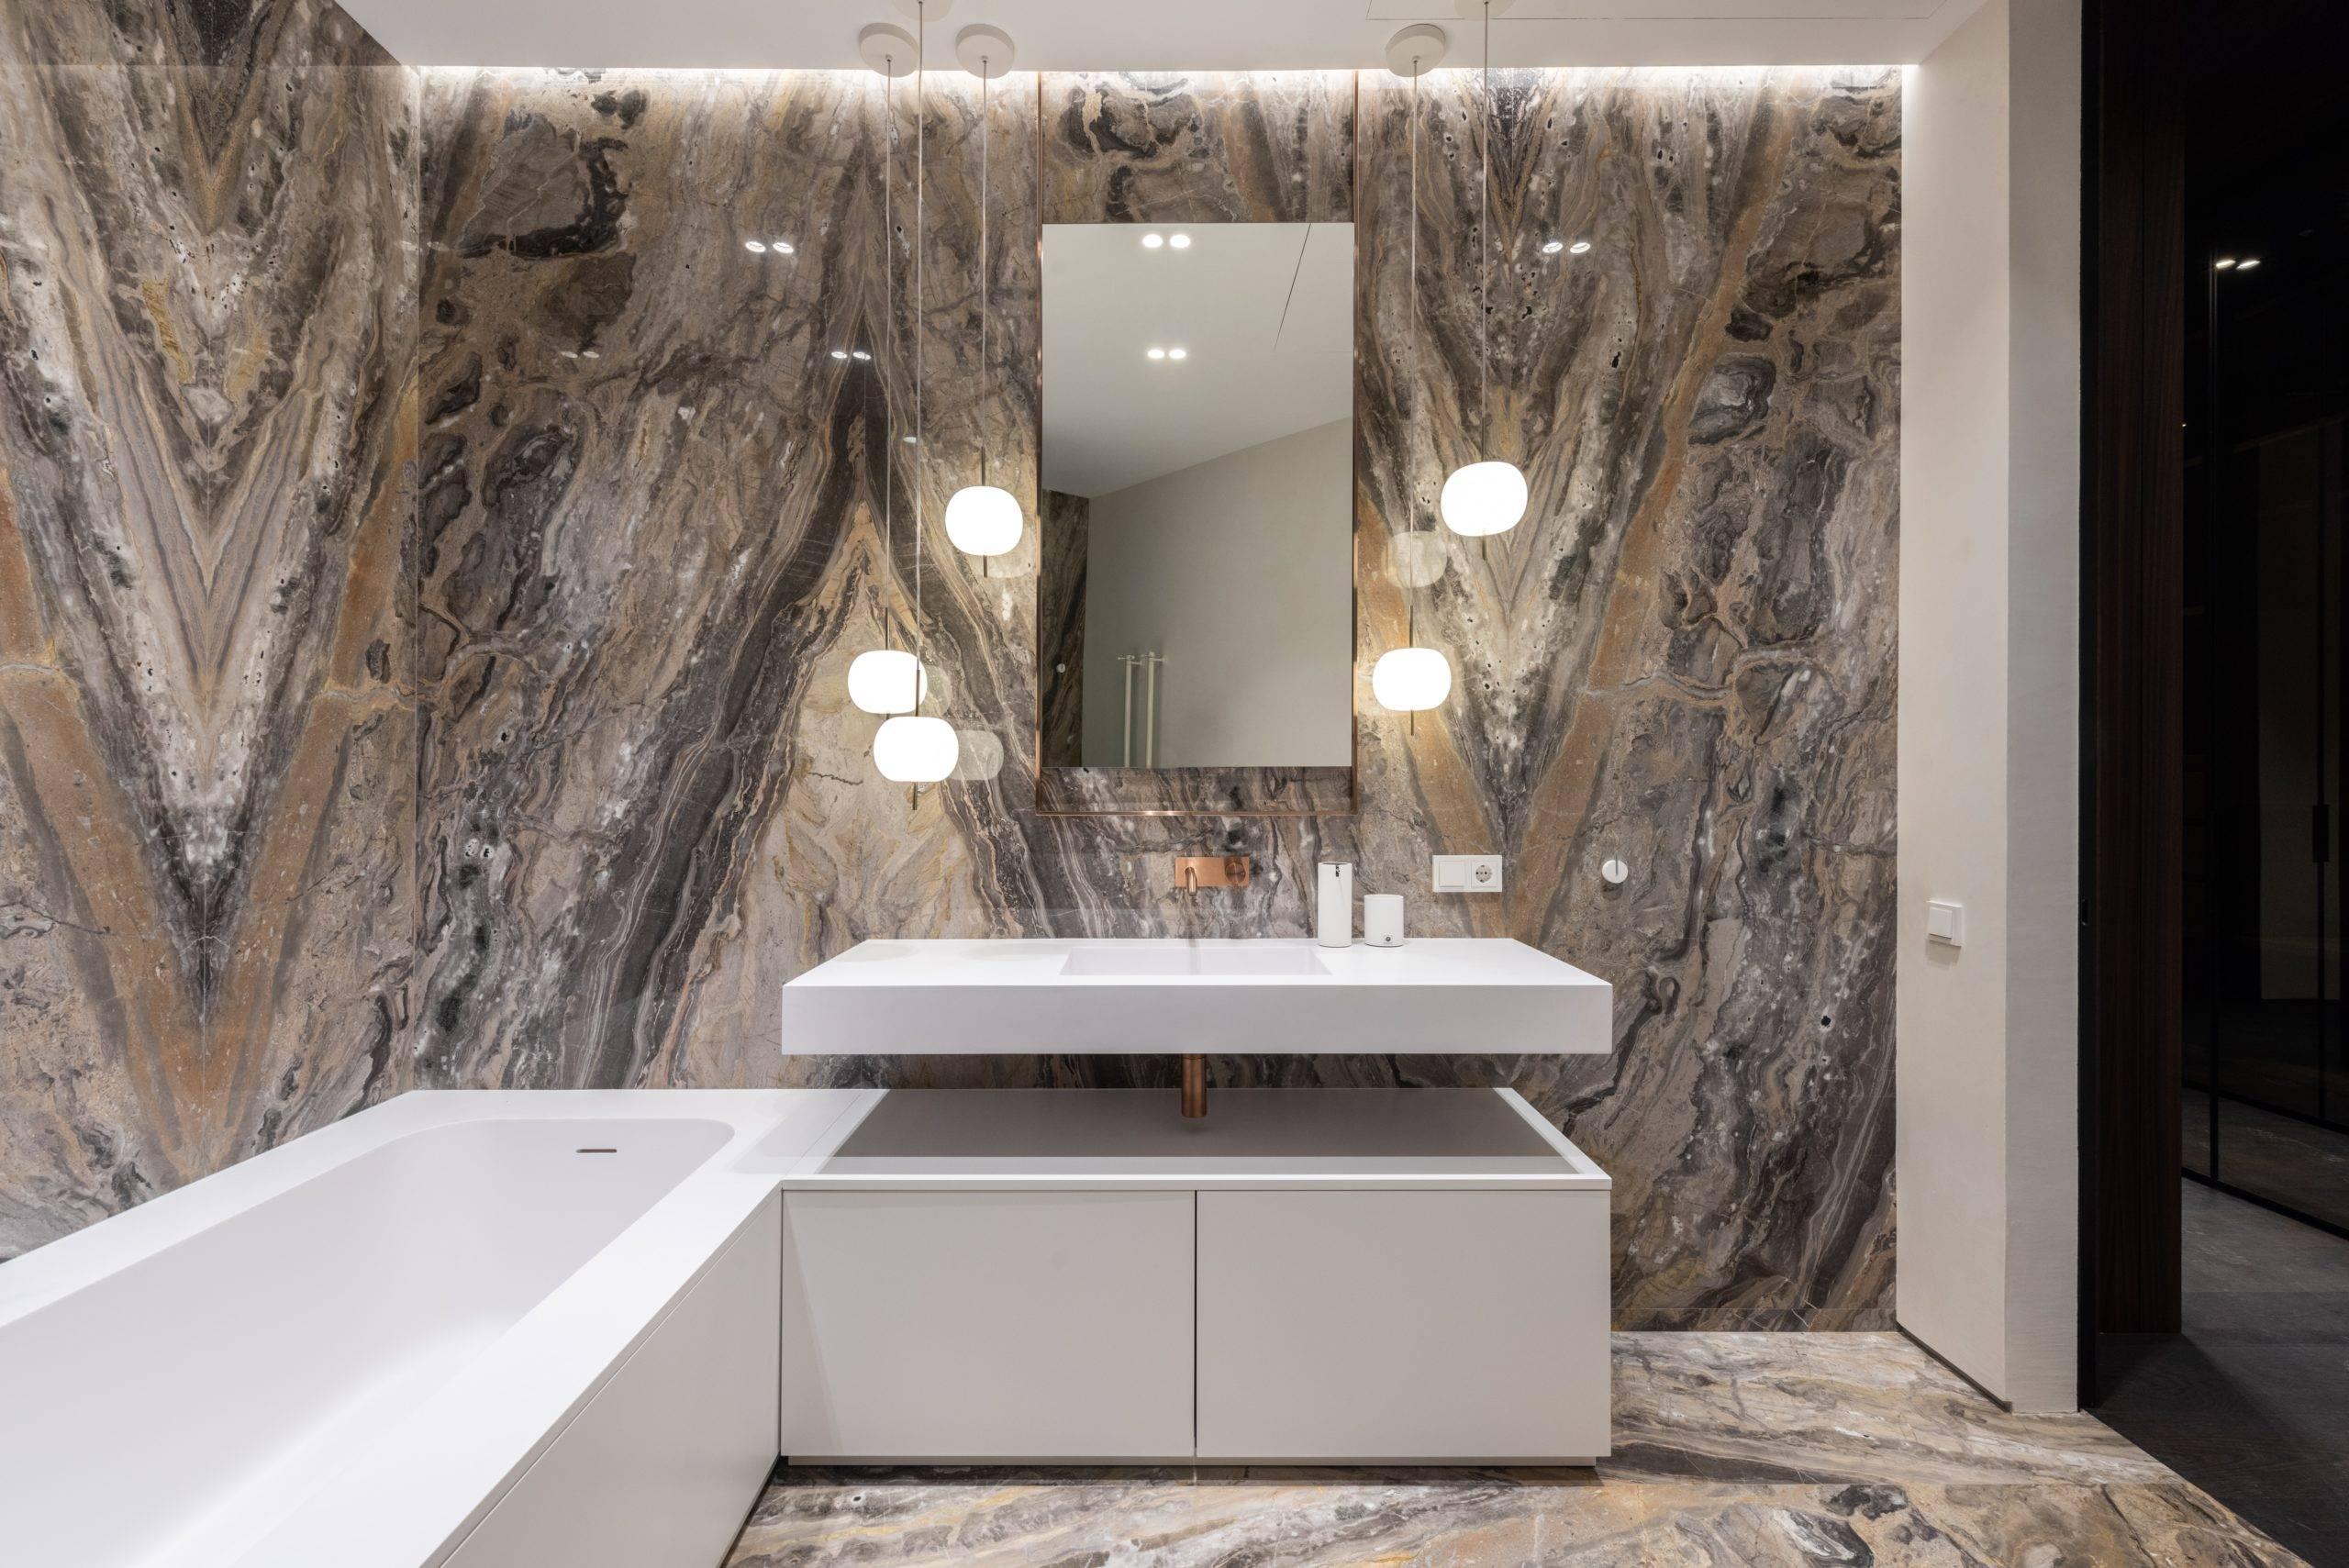 Elegant bathroom with white tub and sink